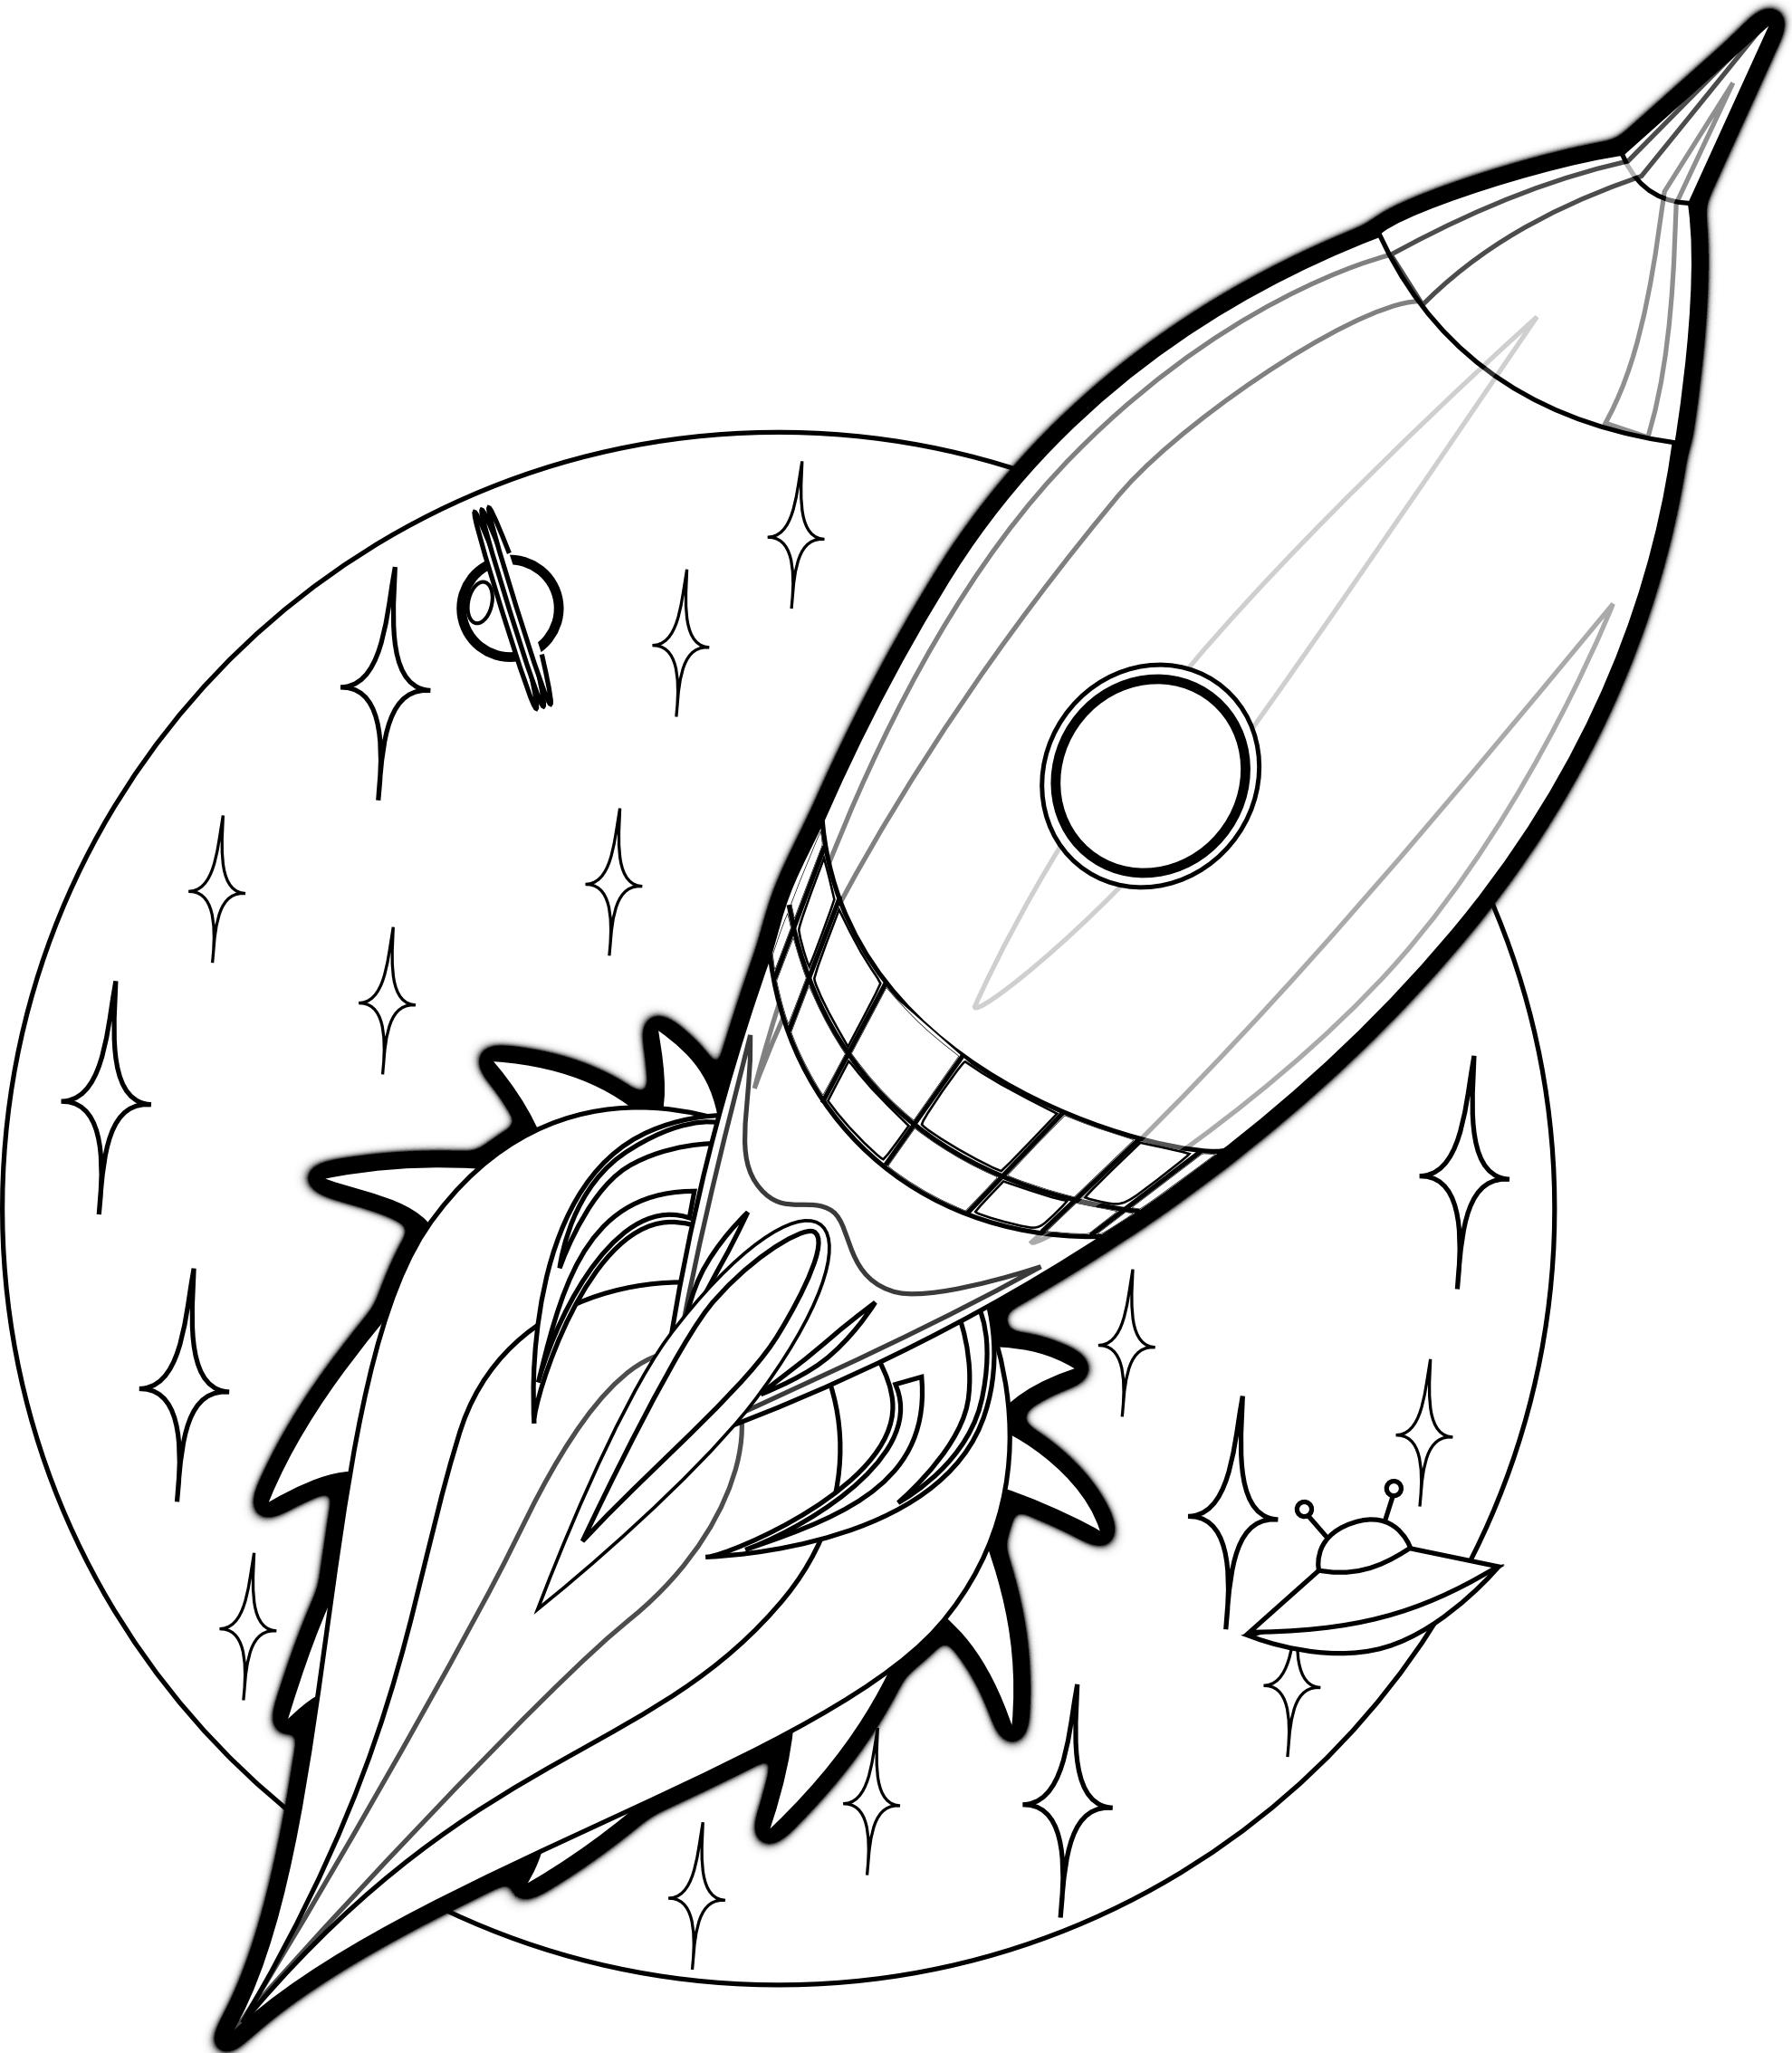 rocket ship coloring page printable rocket ship coloring pages for kids cool2bkids page rocket coloring ship